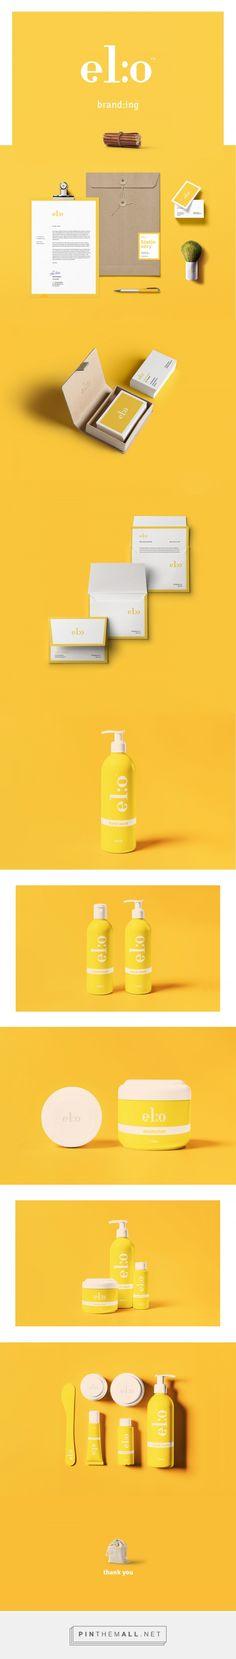 el:o Branding by Felix Joy on Behance   Fivestar Branding – Design and Branding…